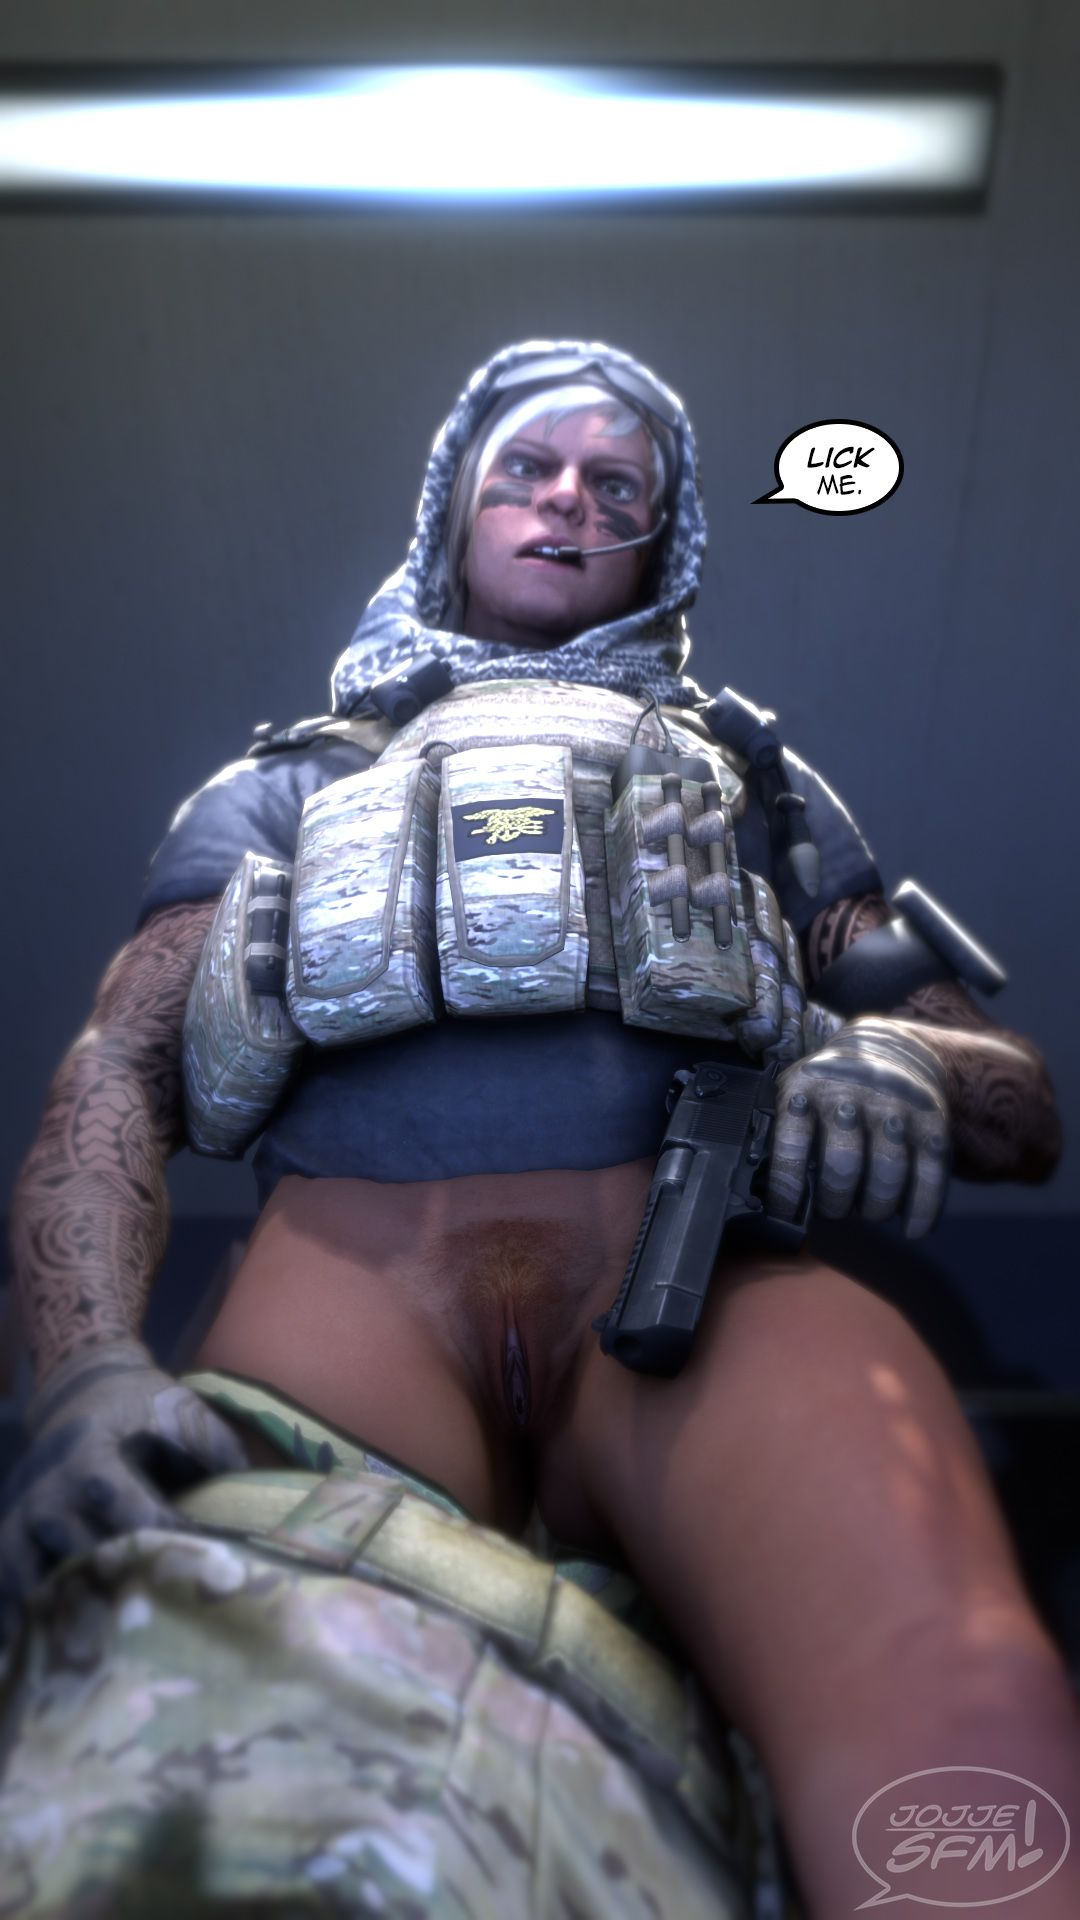 Flaky Cosplay Porn - Rainbow Six: Siege ~ Rule 34 Update Issue Pics] – Nerd Porn!